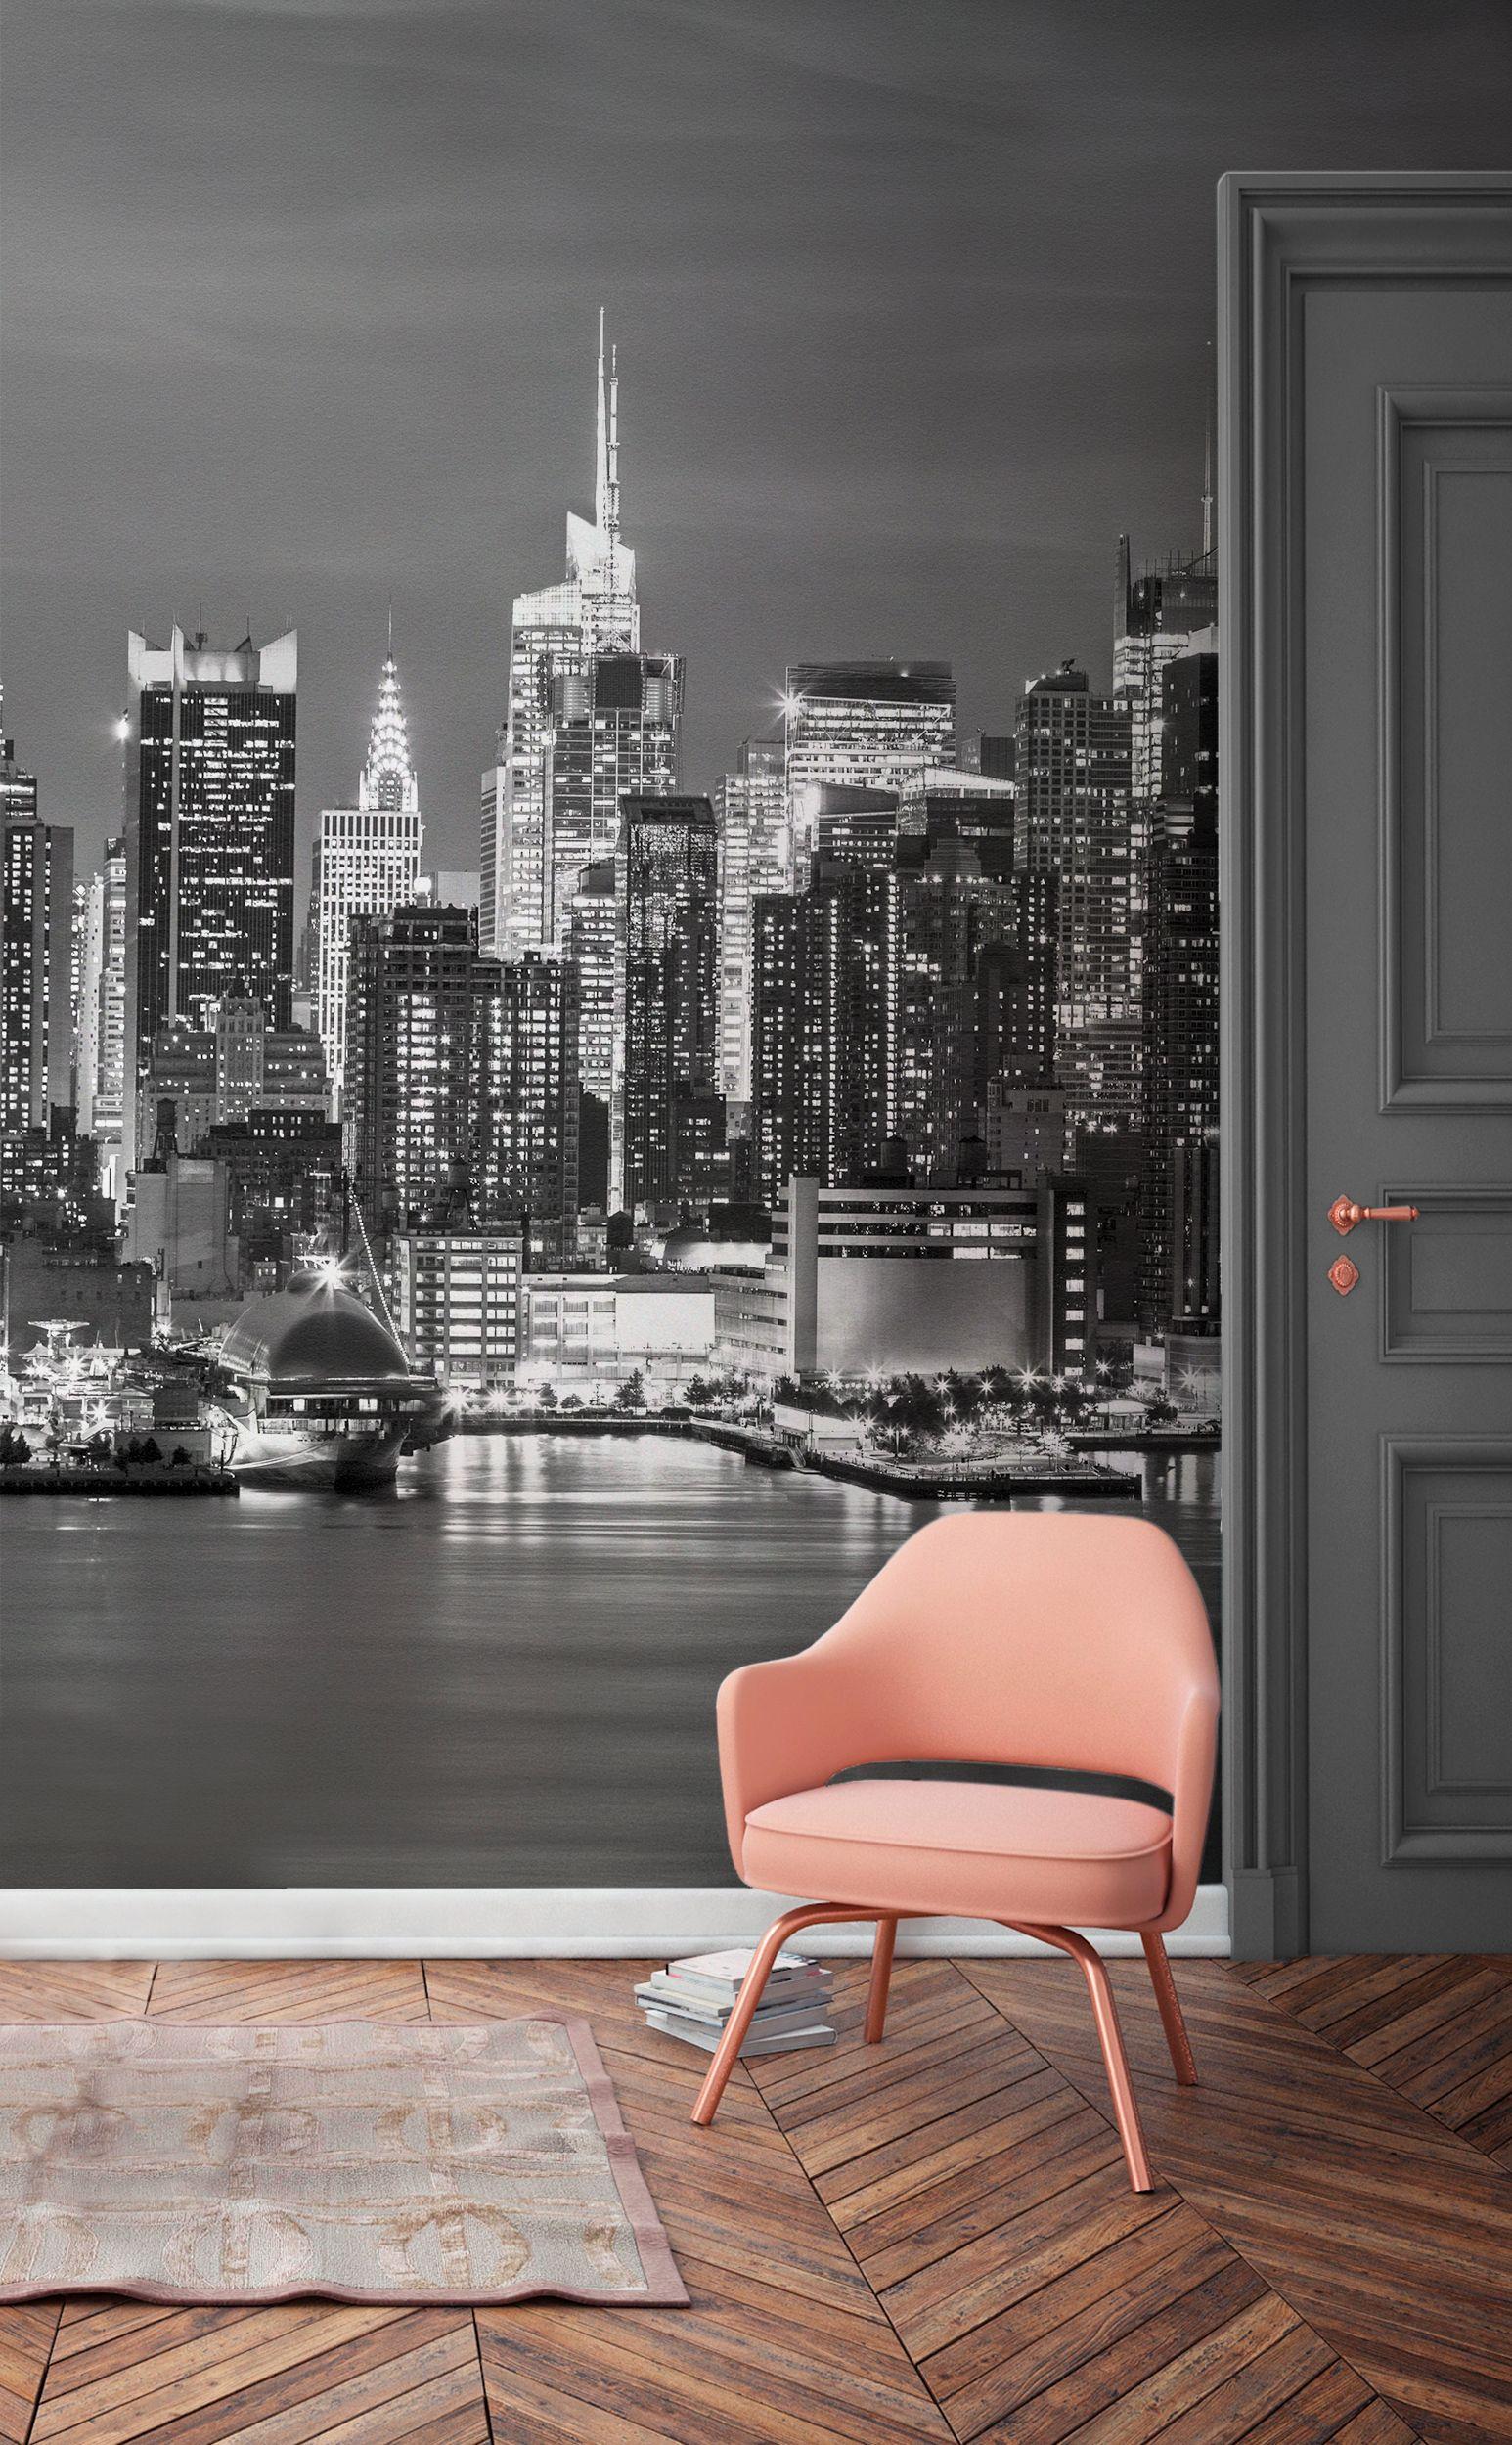 Greyscale New York Landscape Wallpaper Mural New York Bedroom